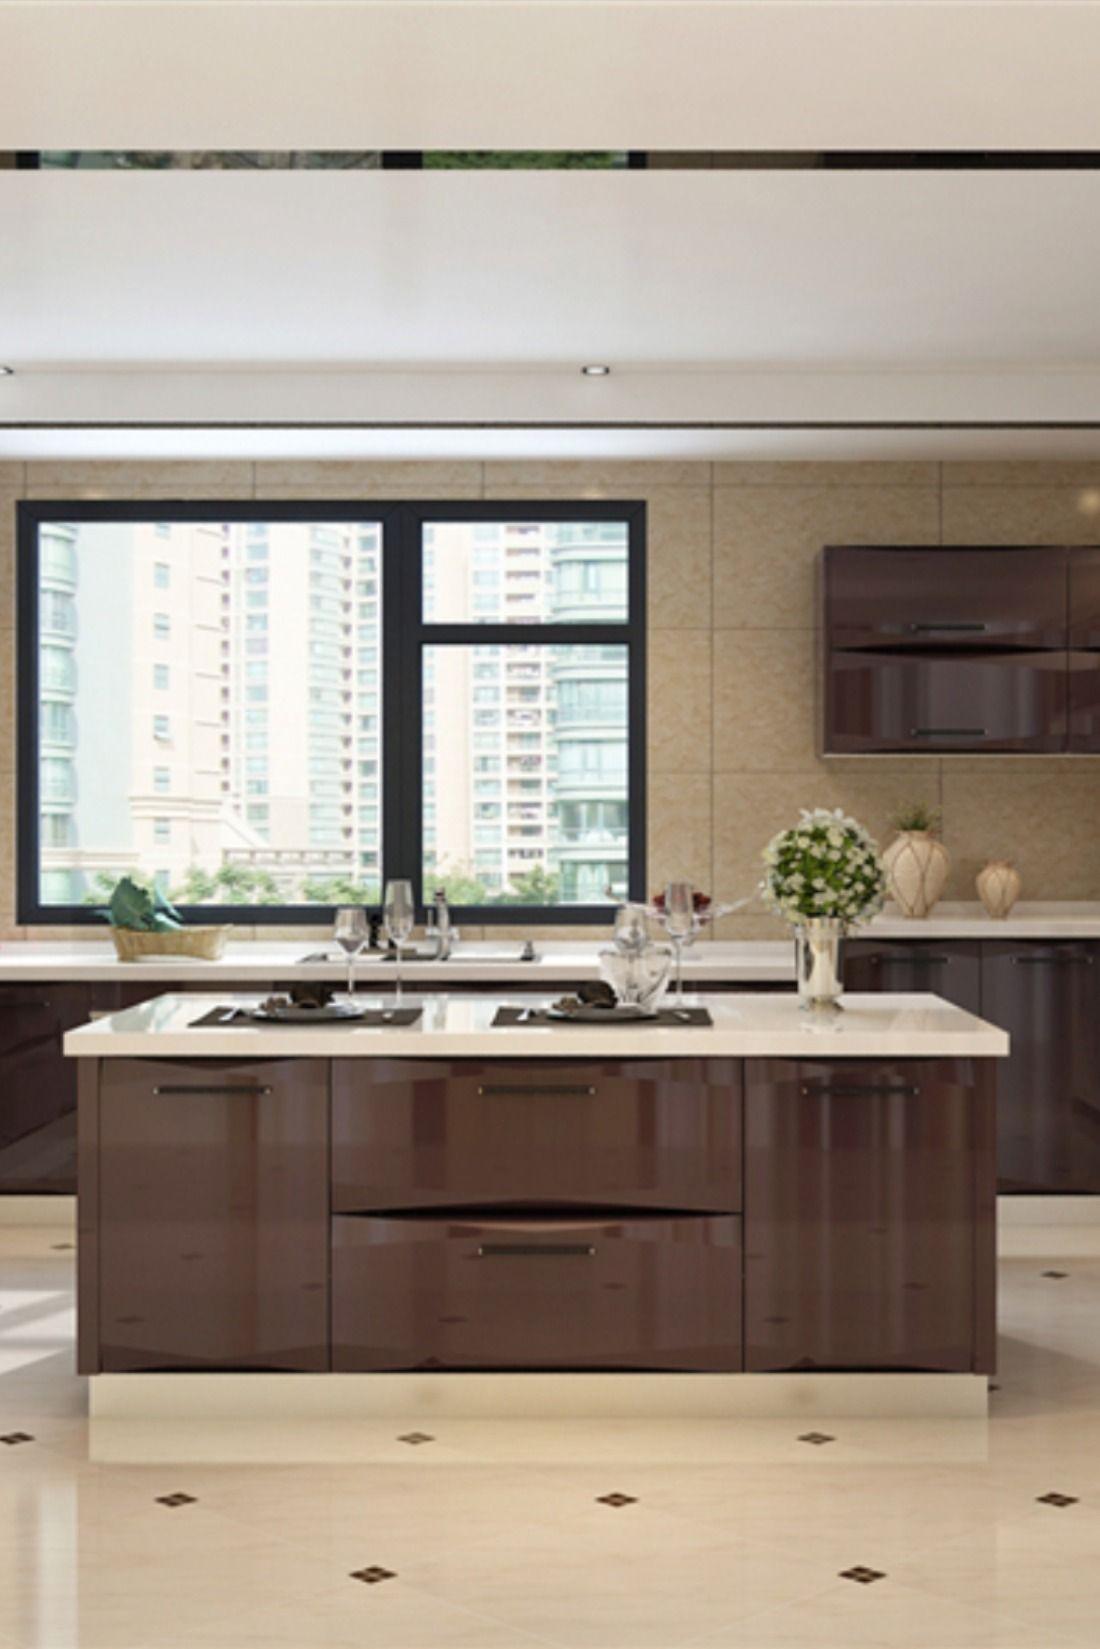 Lacquer Kitchen Cabinet Georgebuildings Kitchen Design Best Kitchen Cabinets Kitchen Cabinets